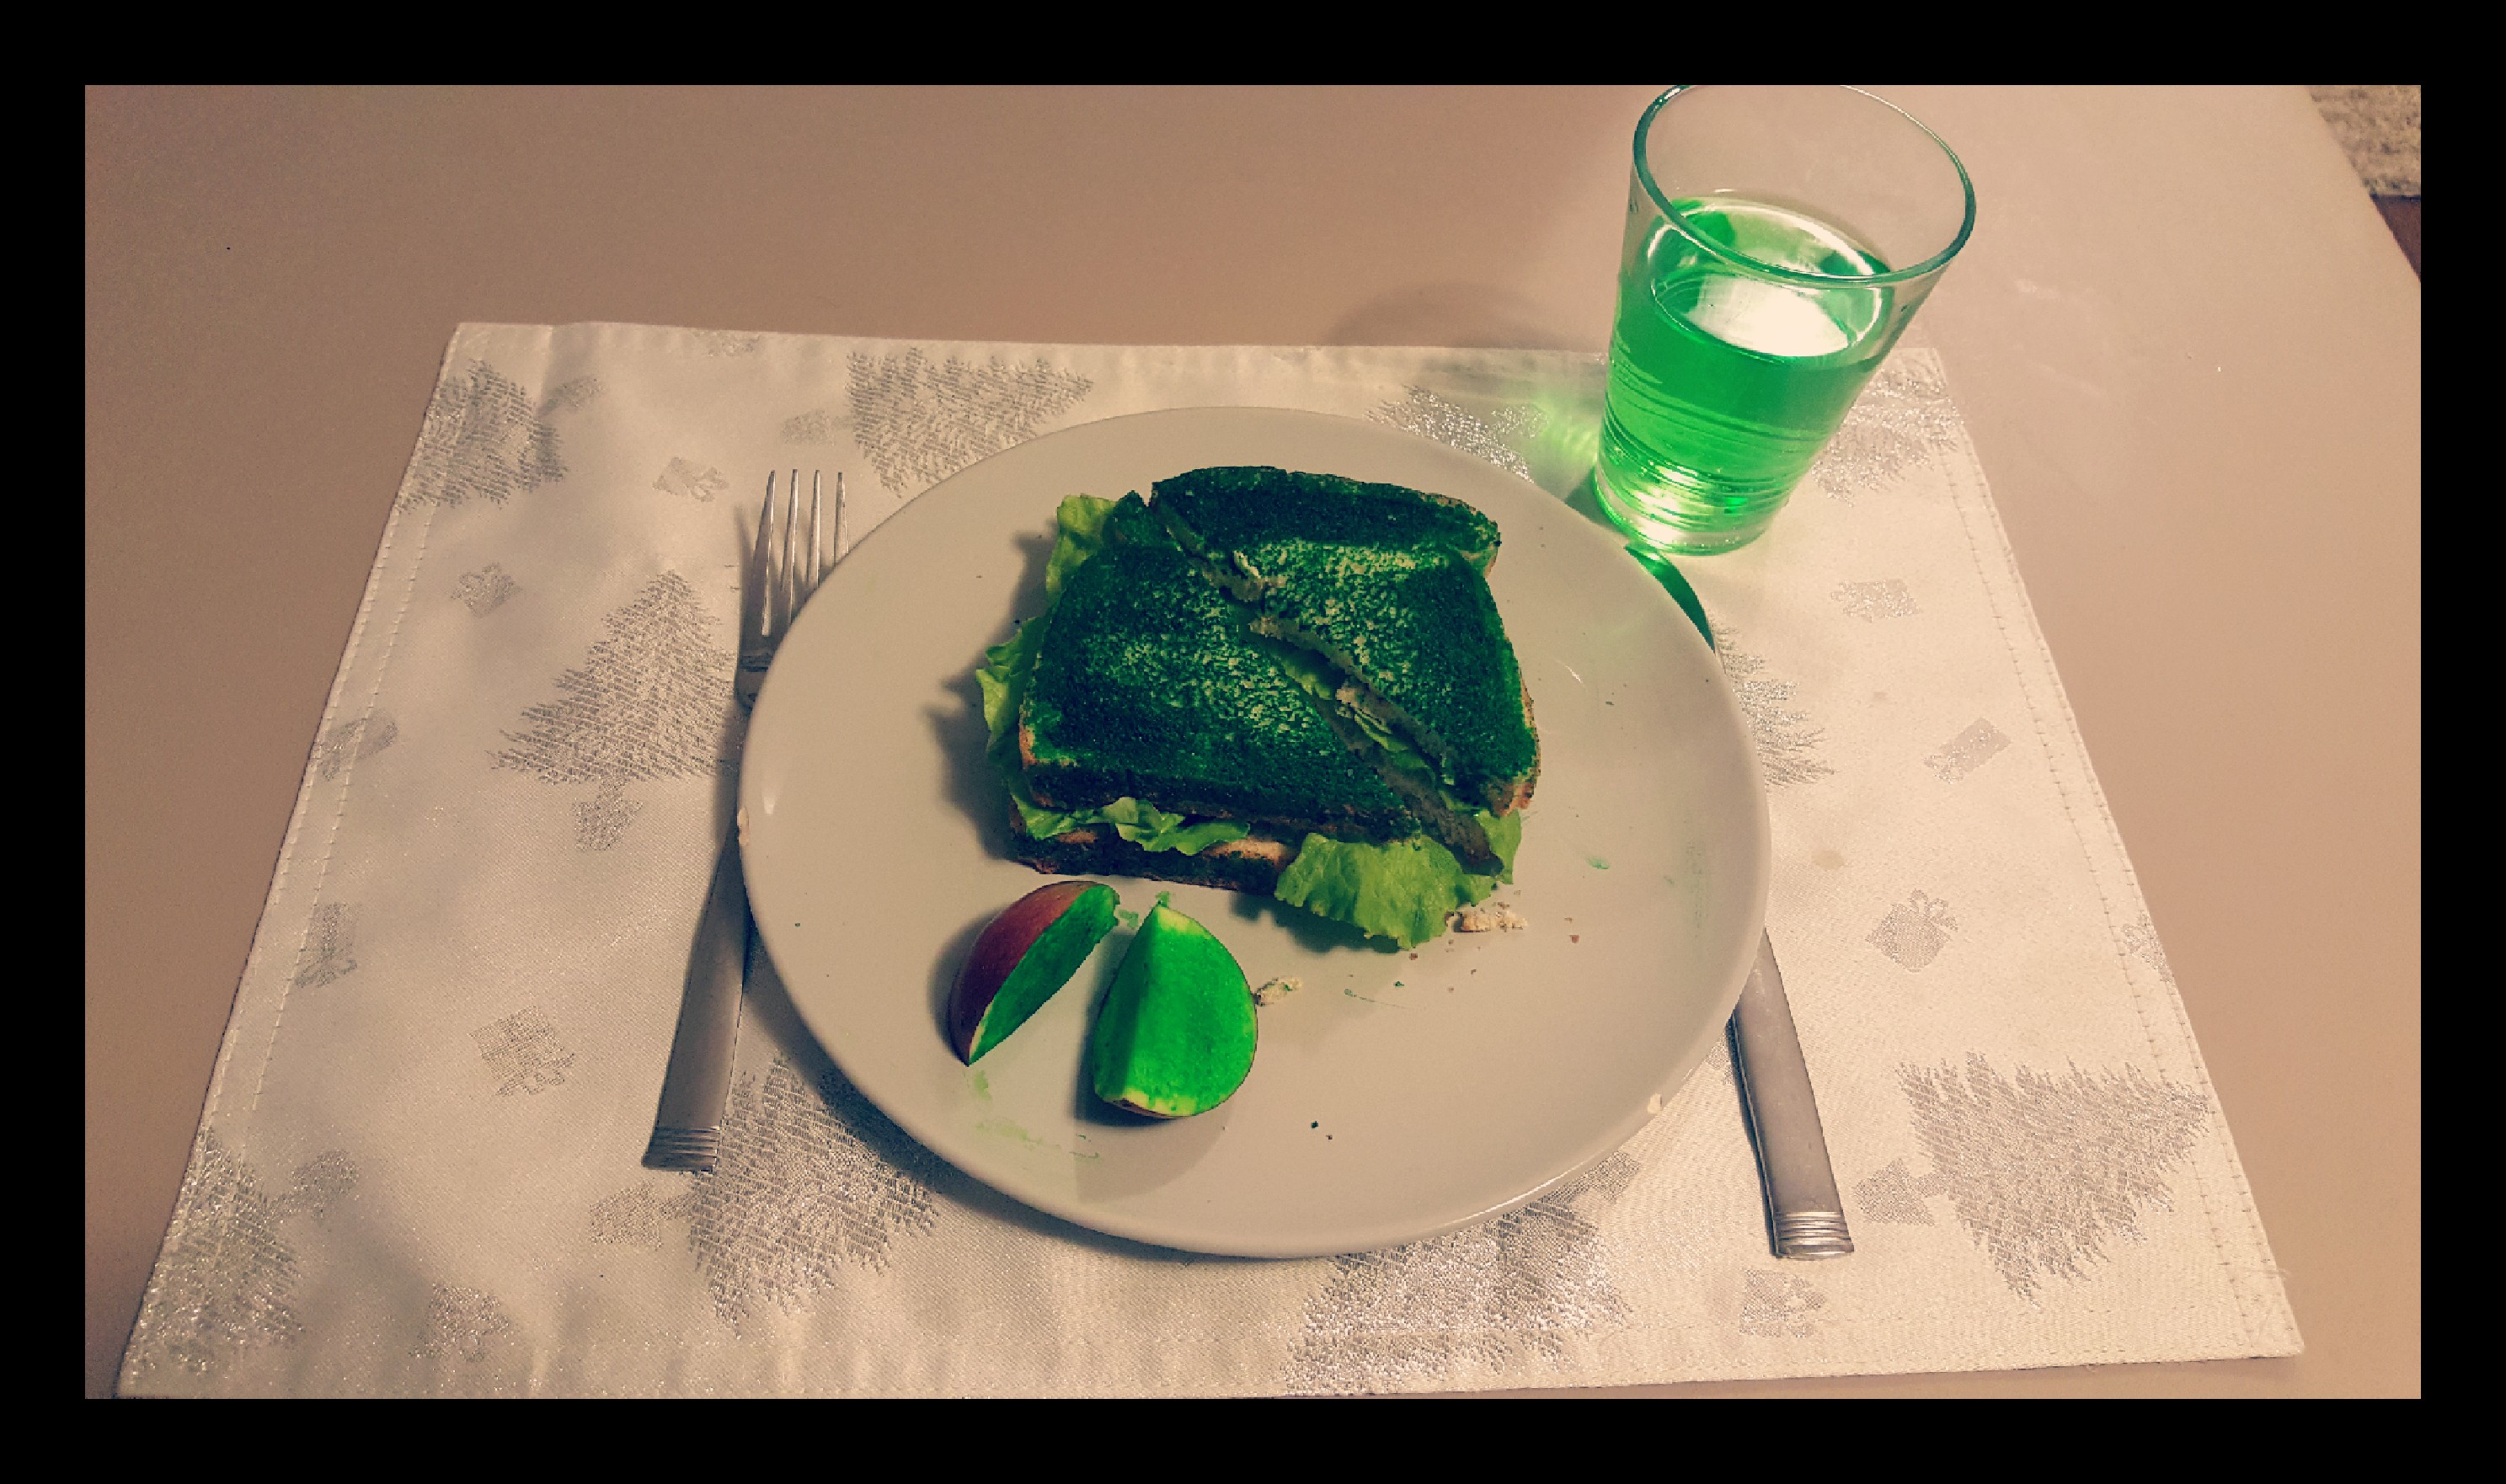 Leprechaun Trap – St. Patrick's Day Adventure